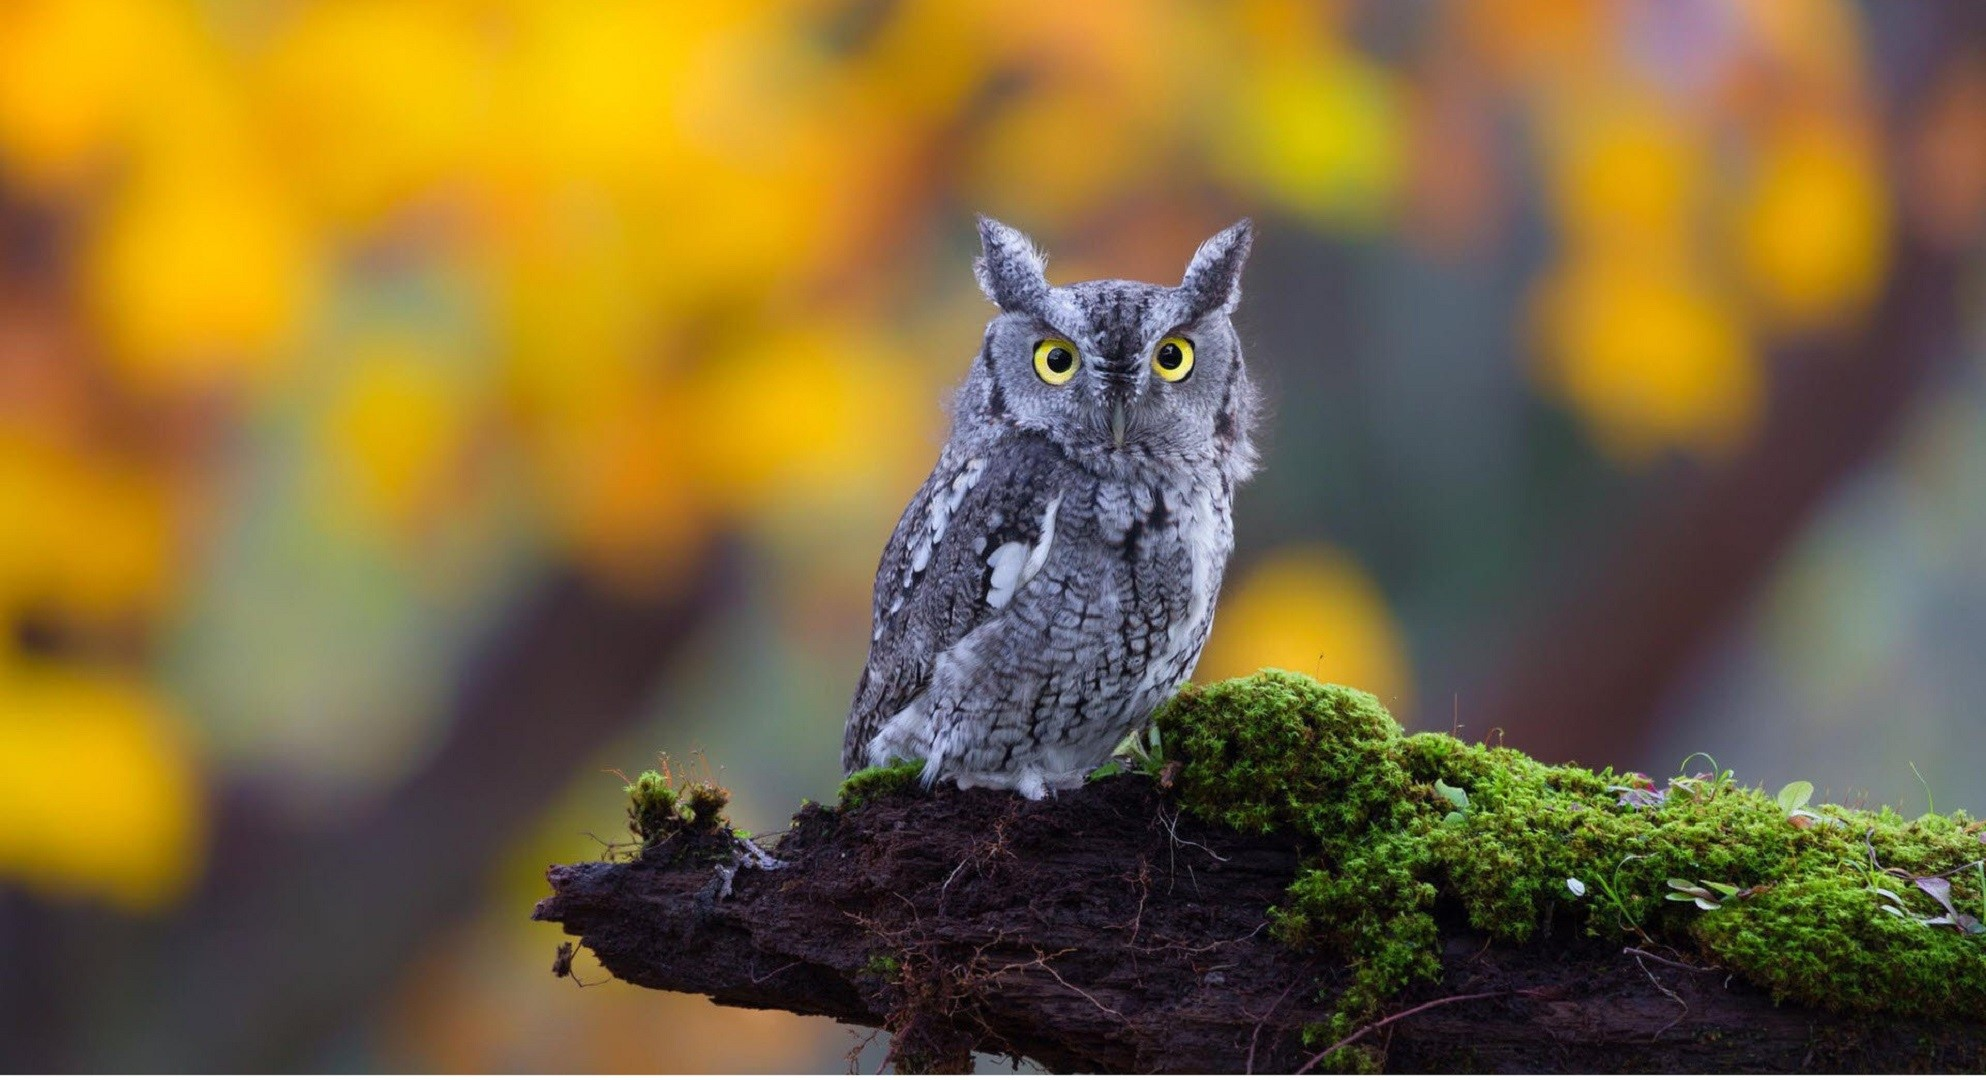 Owl Background images